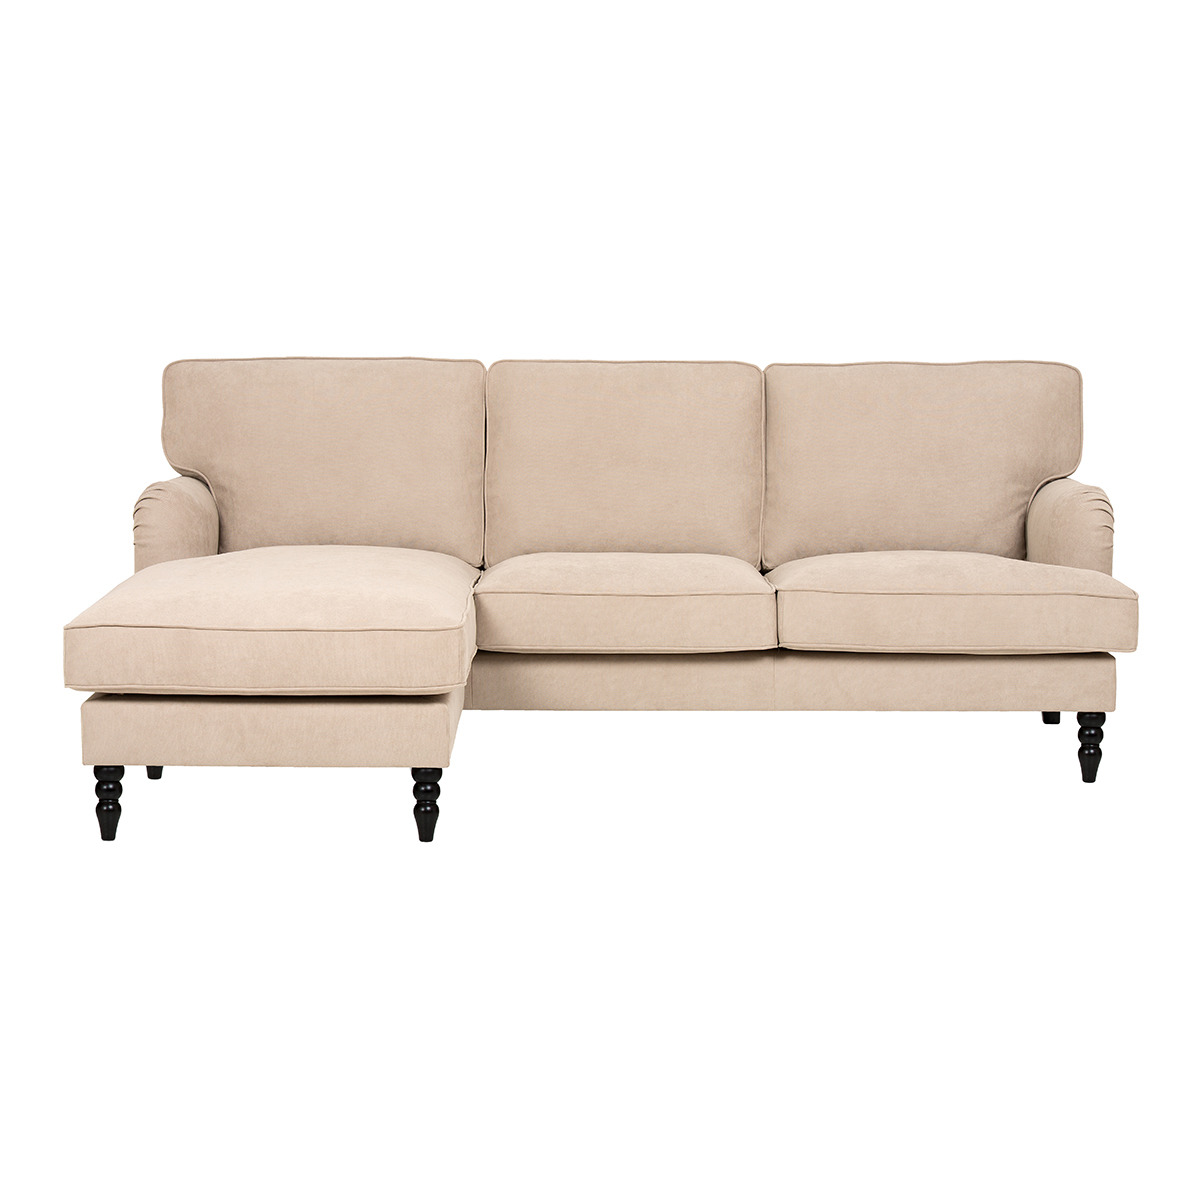 Sofa Corte Ingles Elegant Image Of Chaise Lounge Design Ideas  ~ Sofas Chaise Longue El Corte Ingles